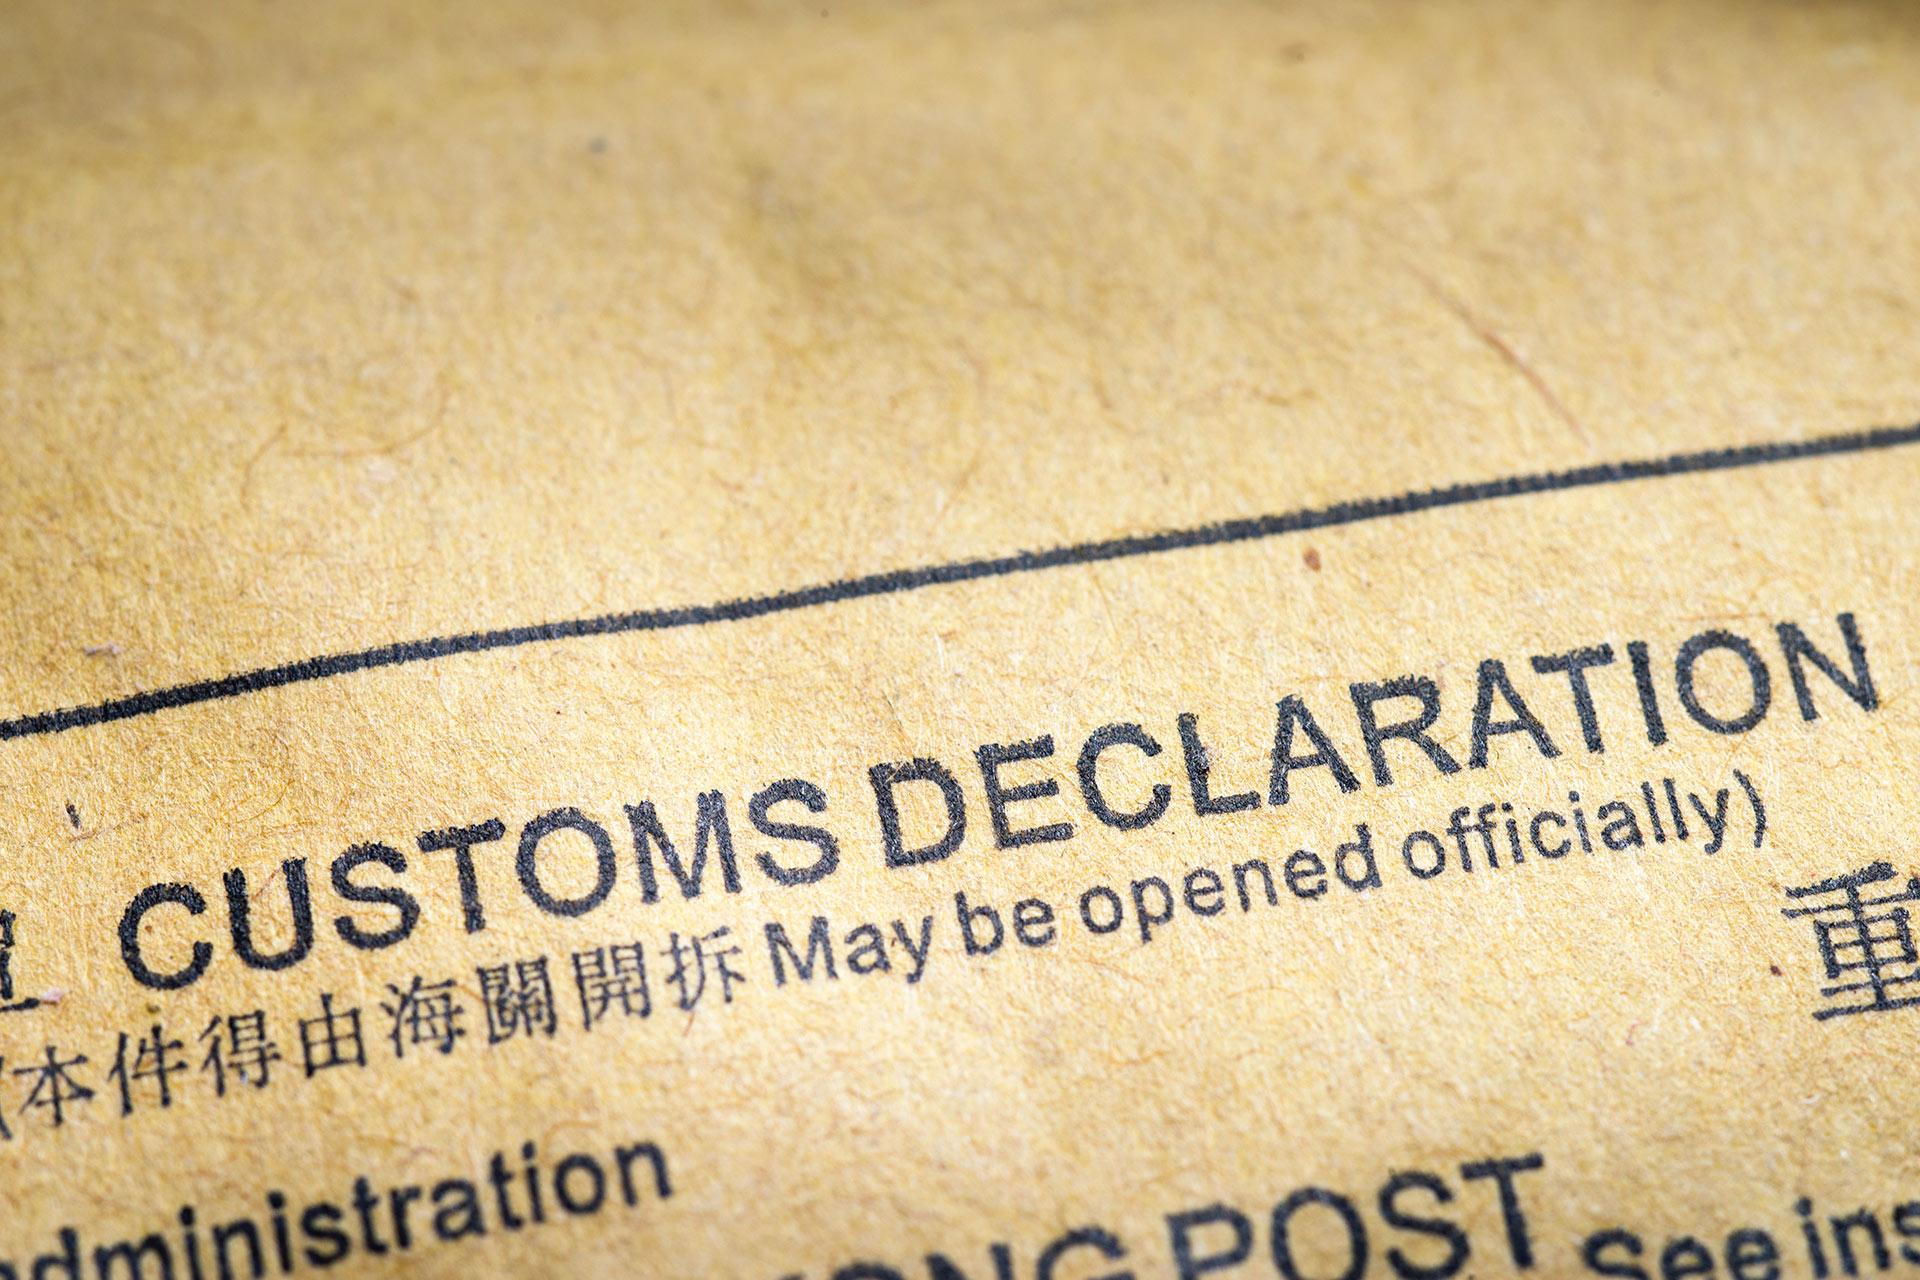 Customs declarations kgh customs thecheapjerseys Choice Image